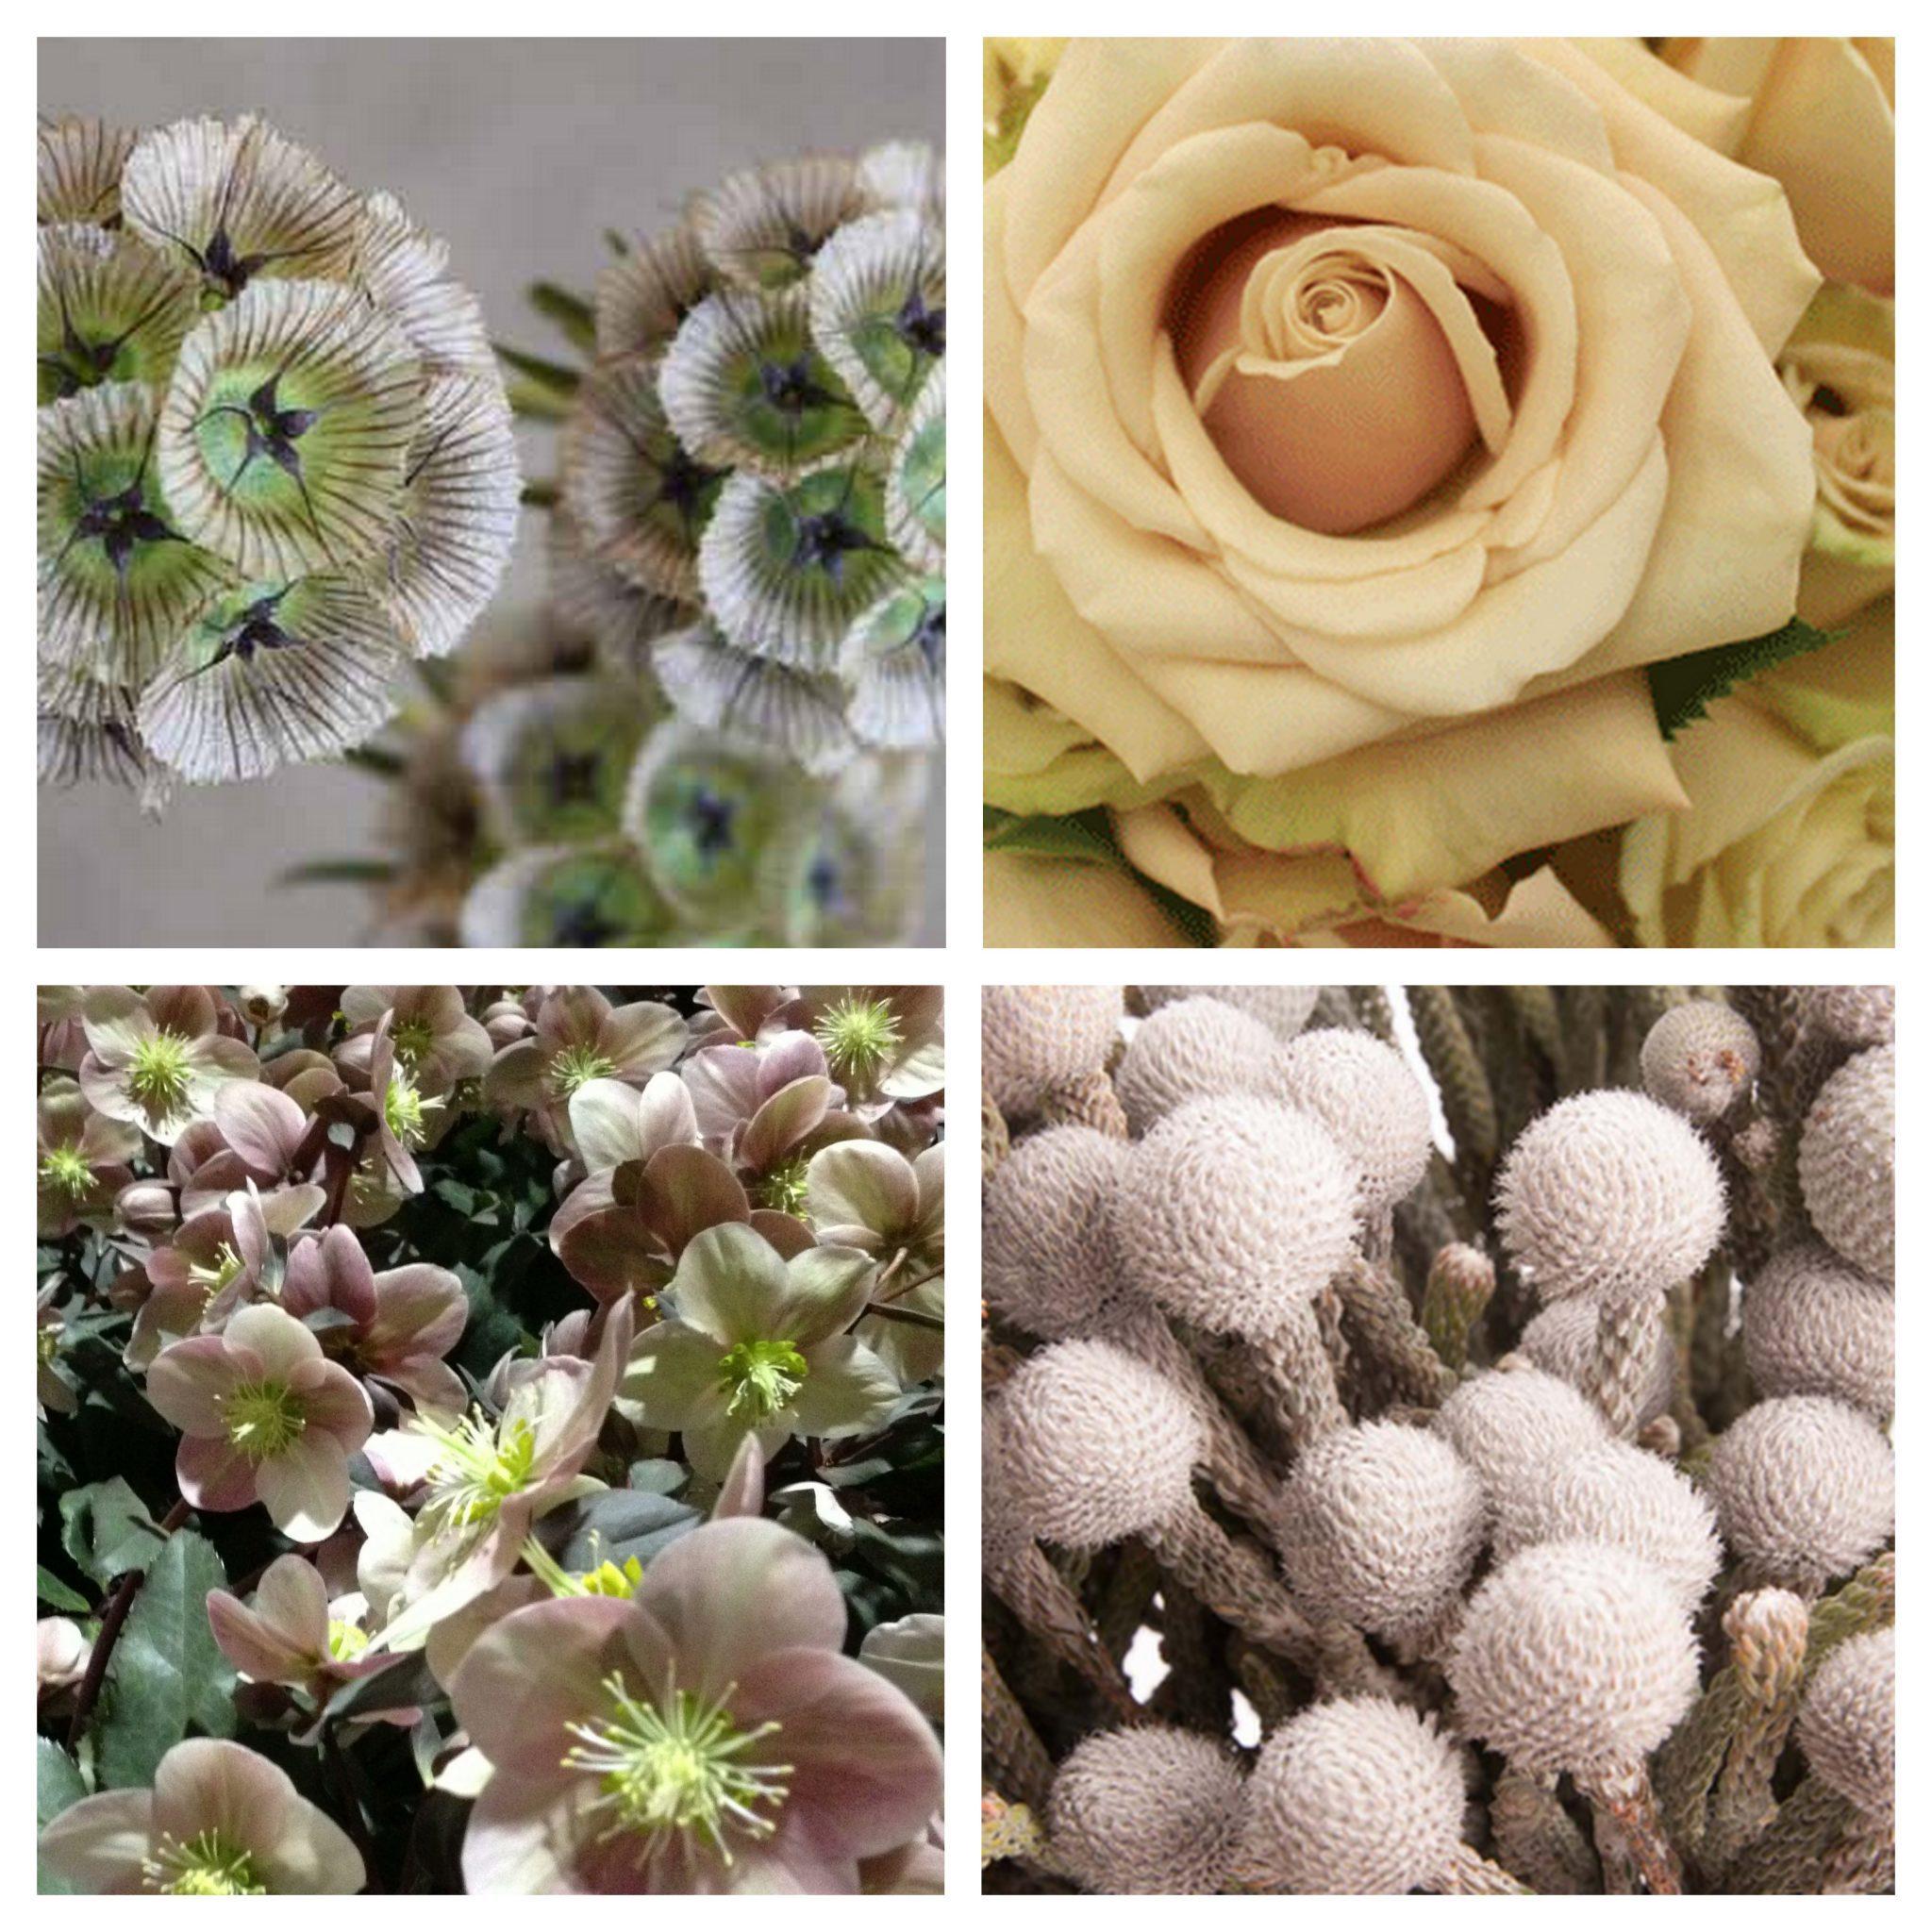 Neutral tone flowers